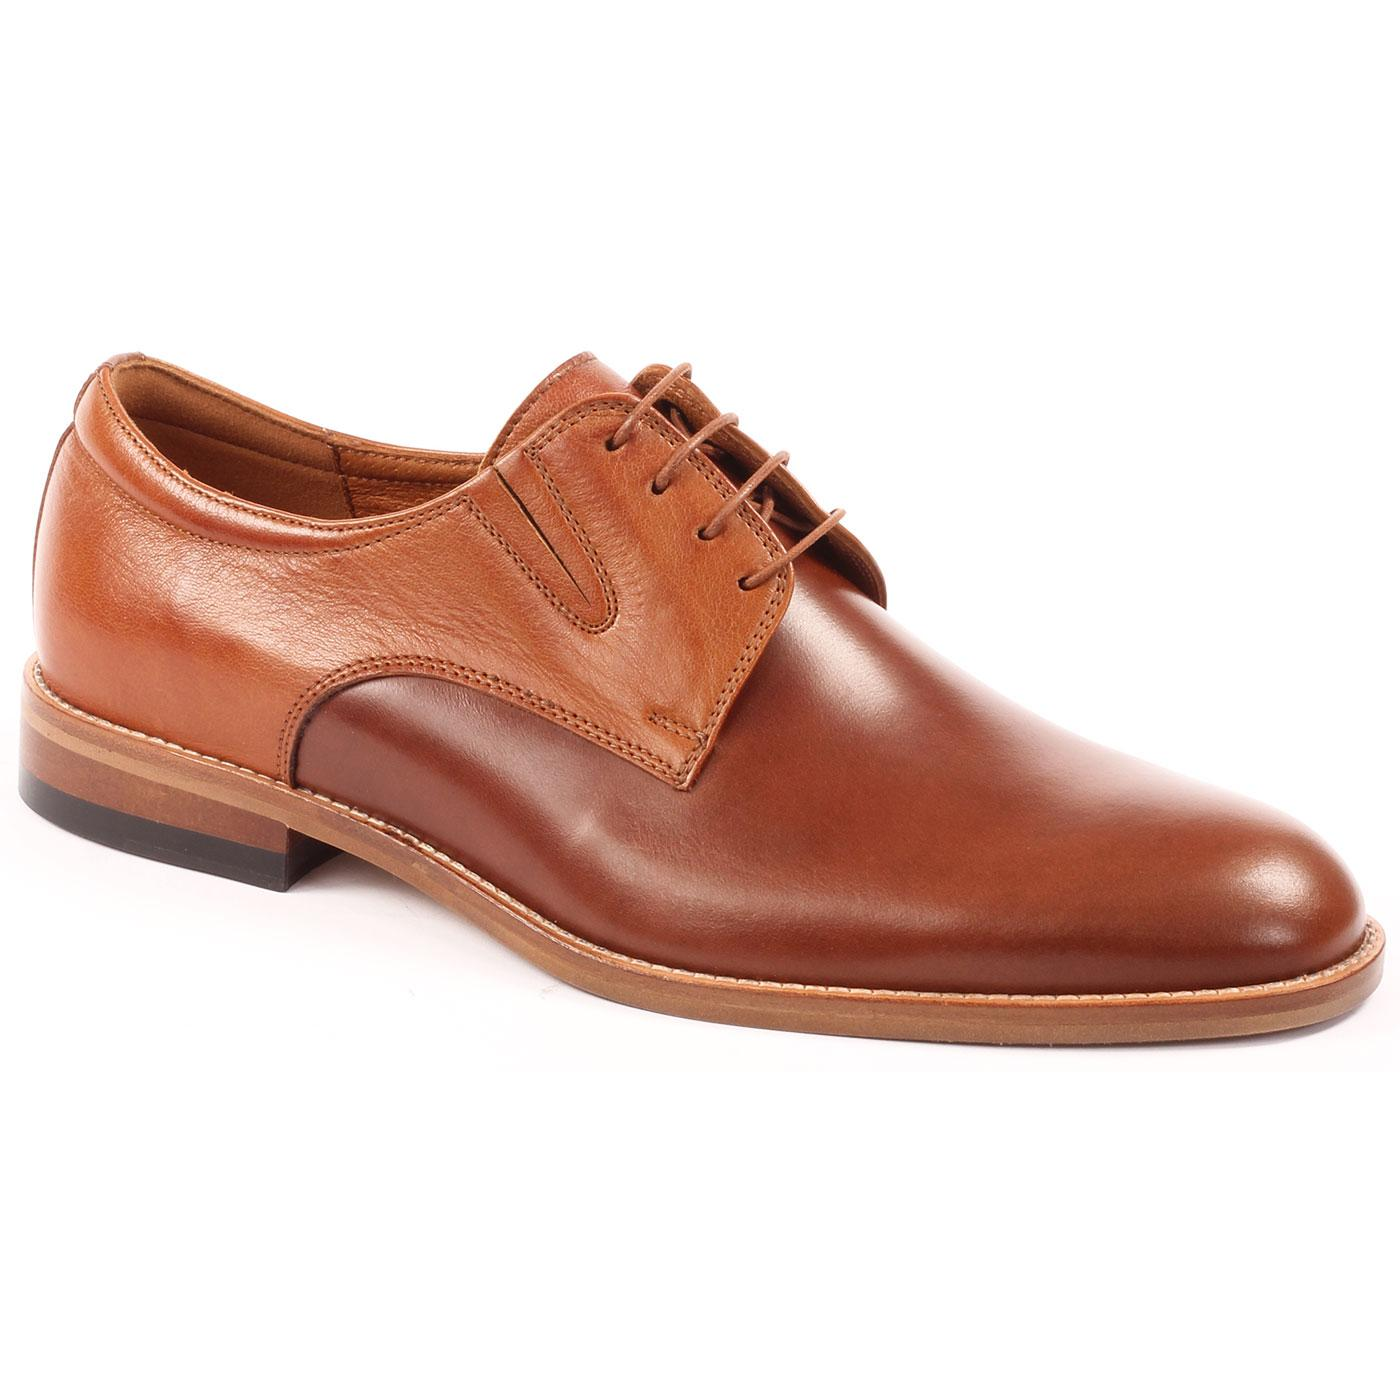 LACUZZO Retro Mod Two Tone Gusset Derby Shoes TAN